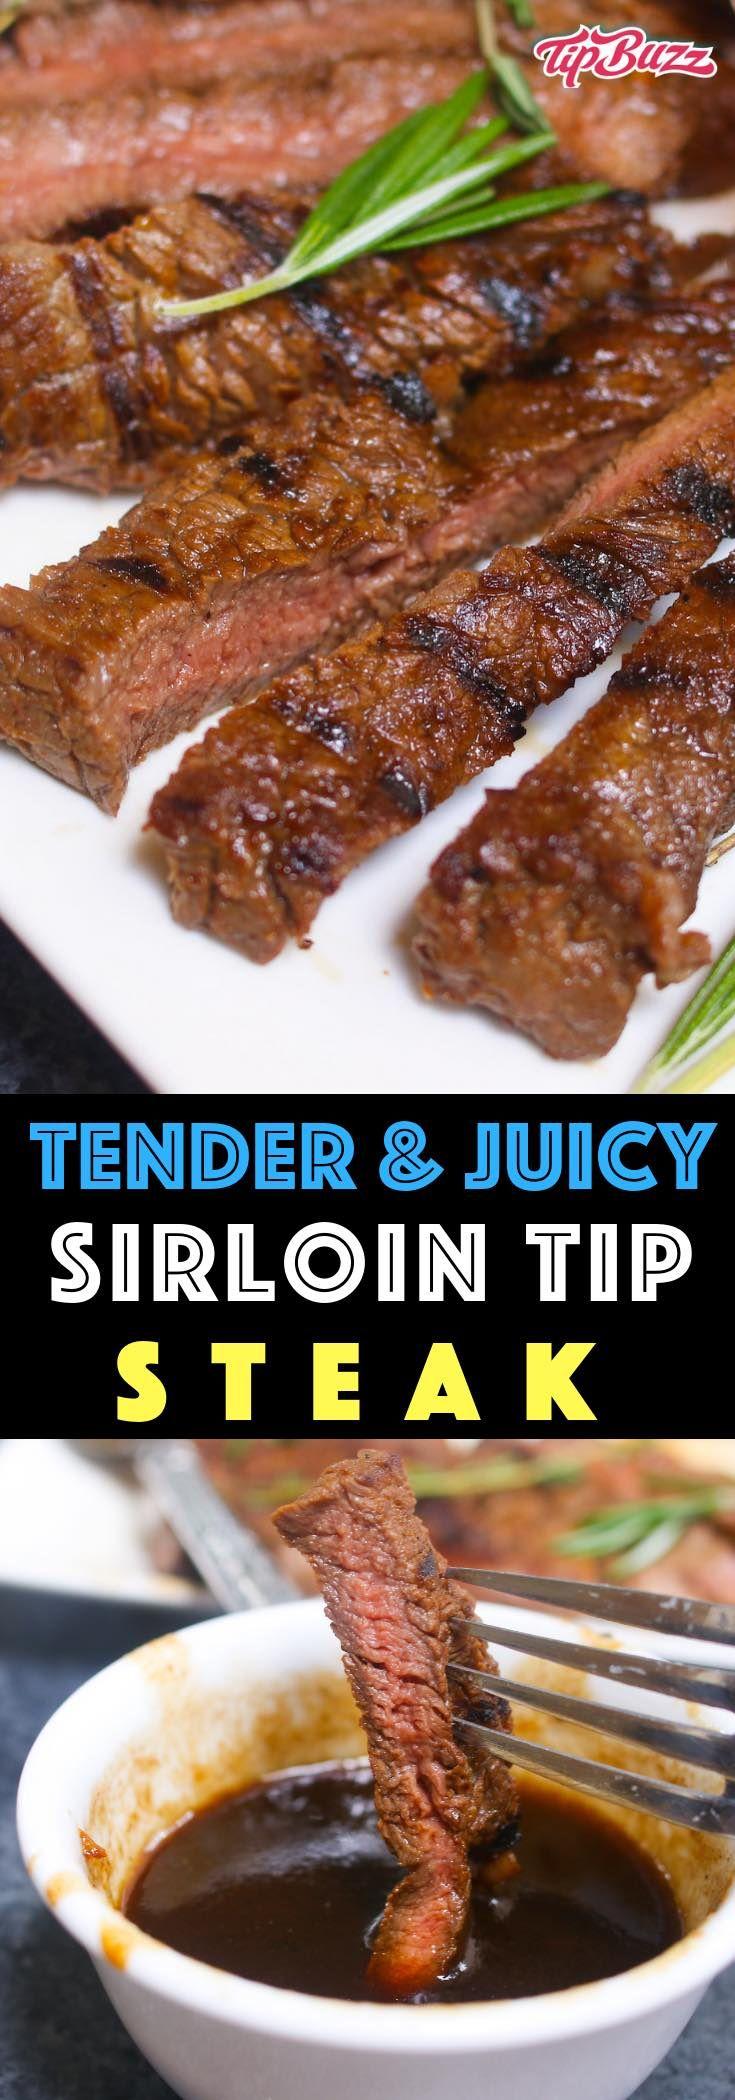 Sirloin Tip Steak with Balsamic Marinade